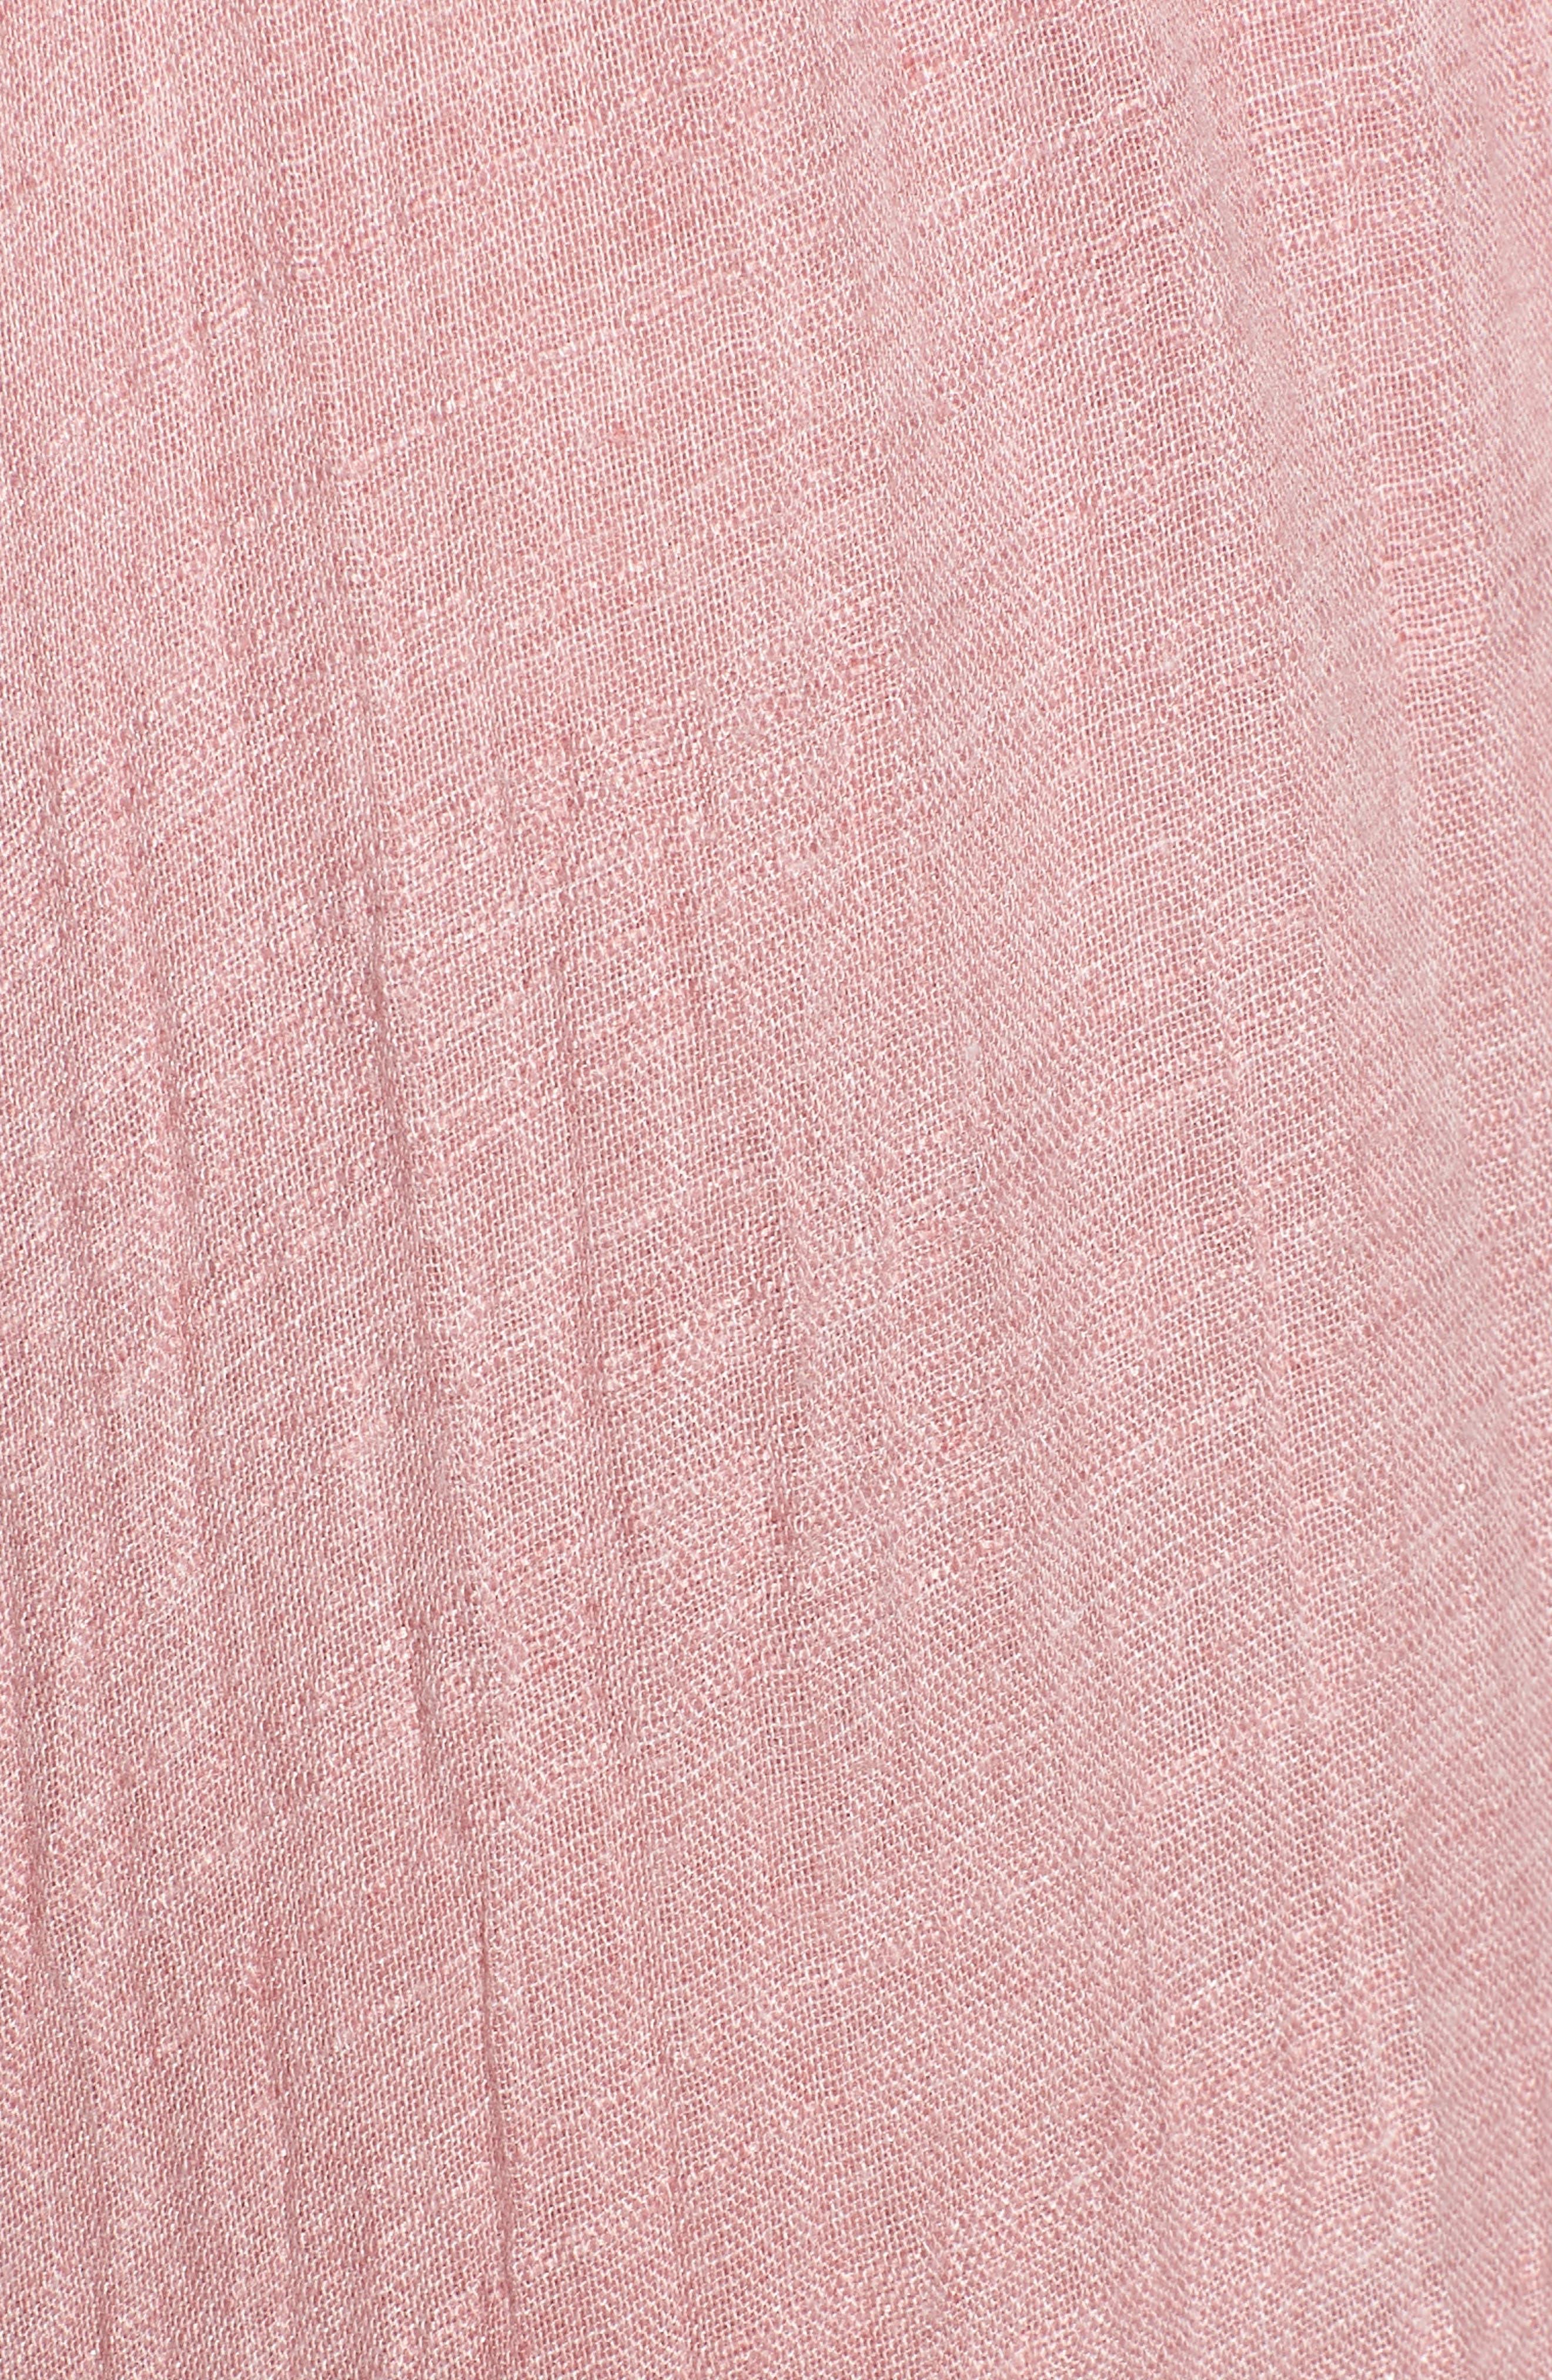 Nicolleta Tie Waist Midi Dress,                             Alternate thumbnail 5, color,                             Dusty Pink